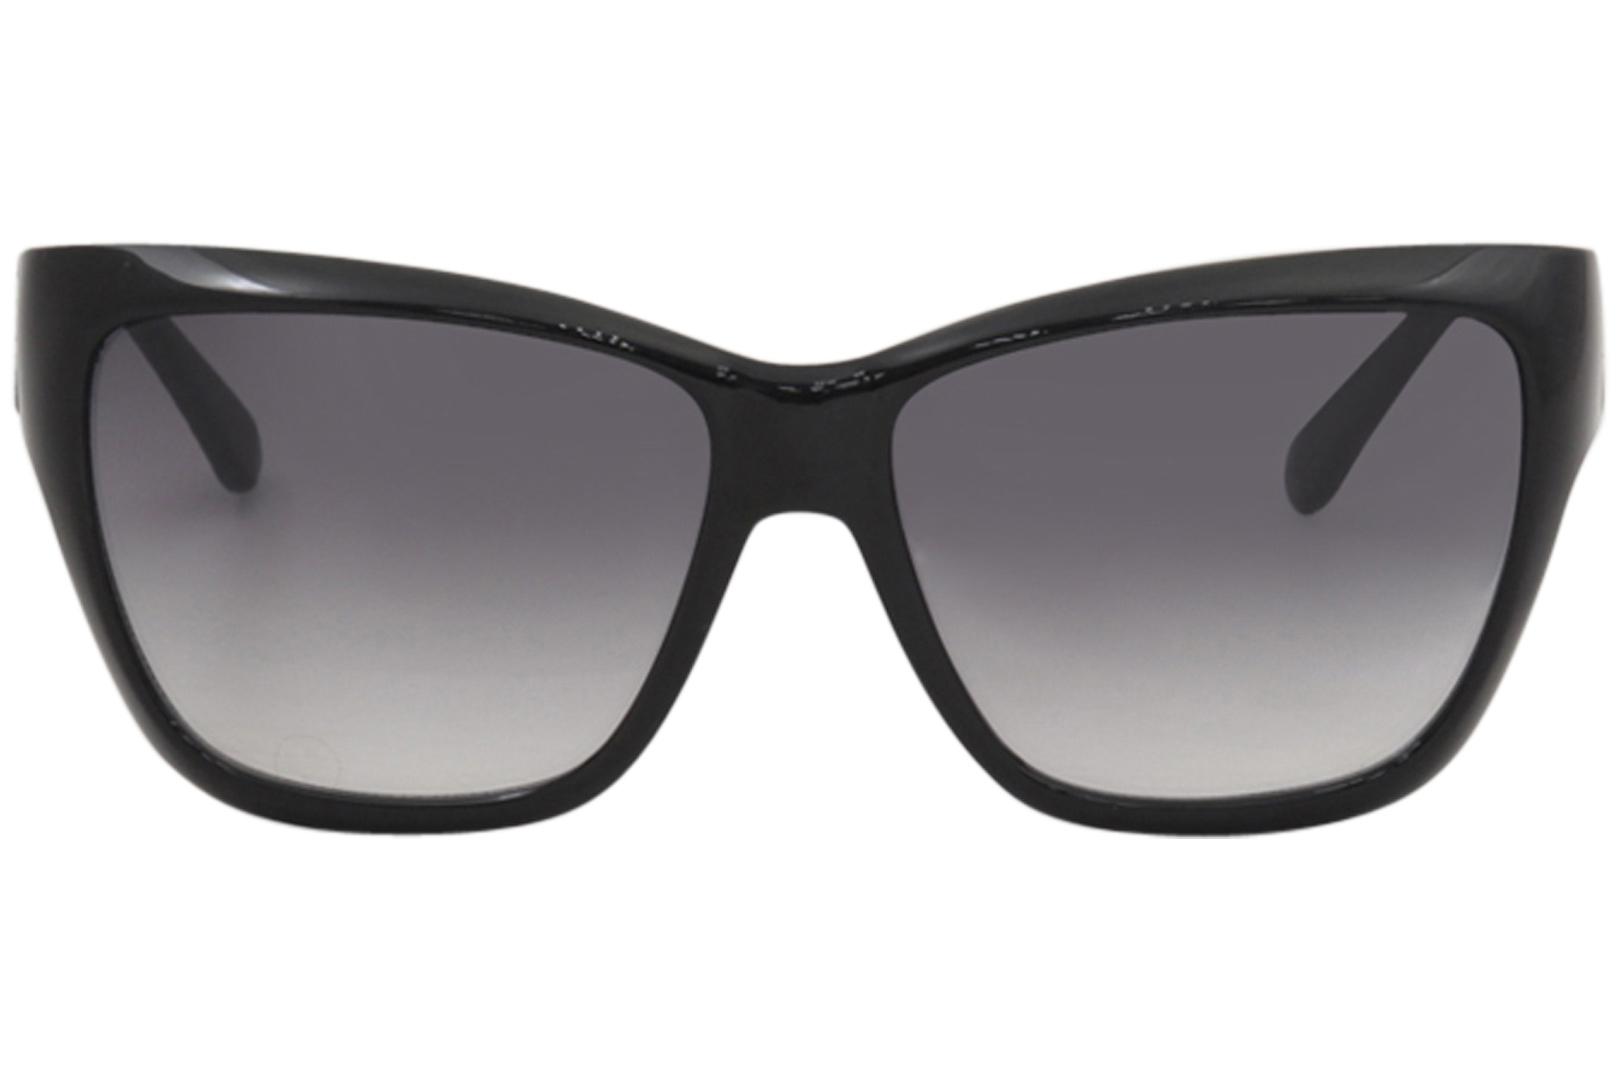 a6efc1d409e Guess Women s GU7374 GU 7374 BLK-35 Black Fashion Square Sunglasses 57mm 2  2 of 5 ...